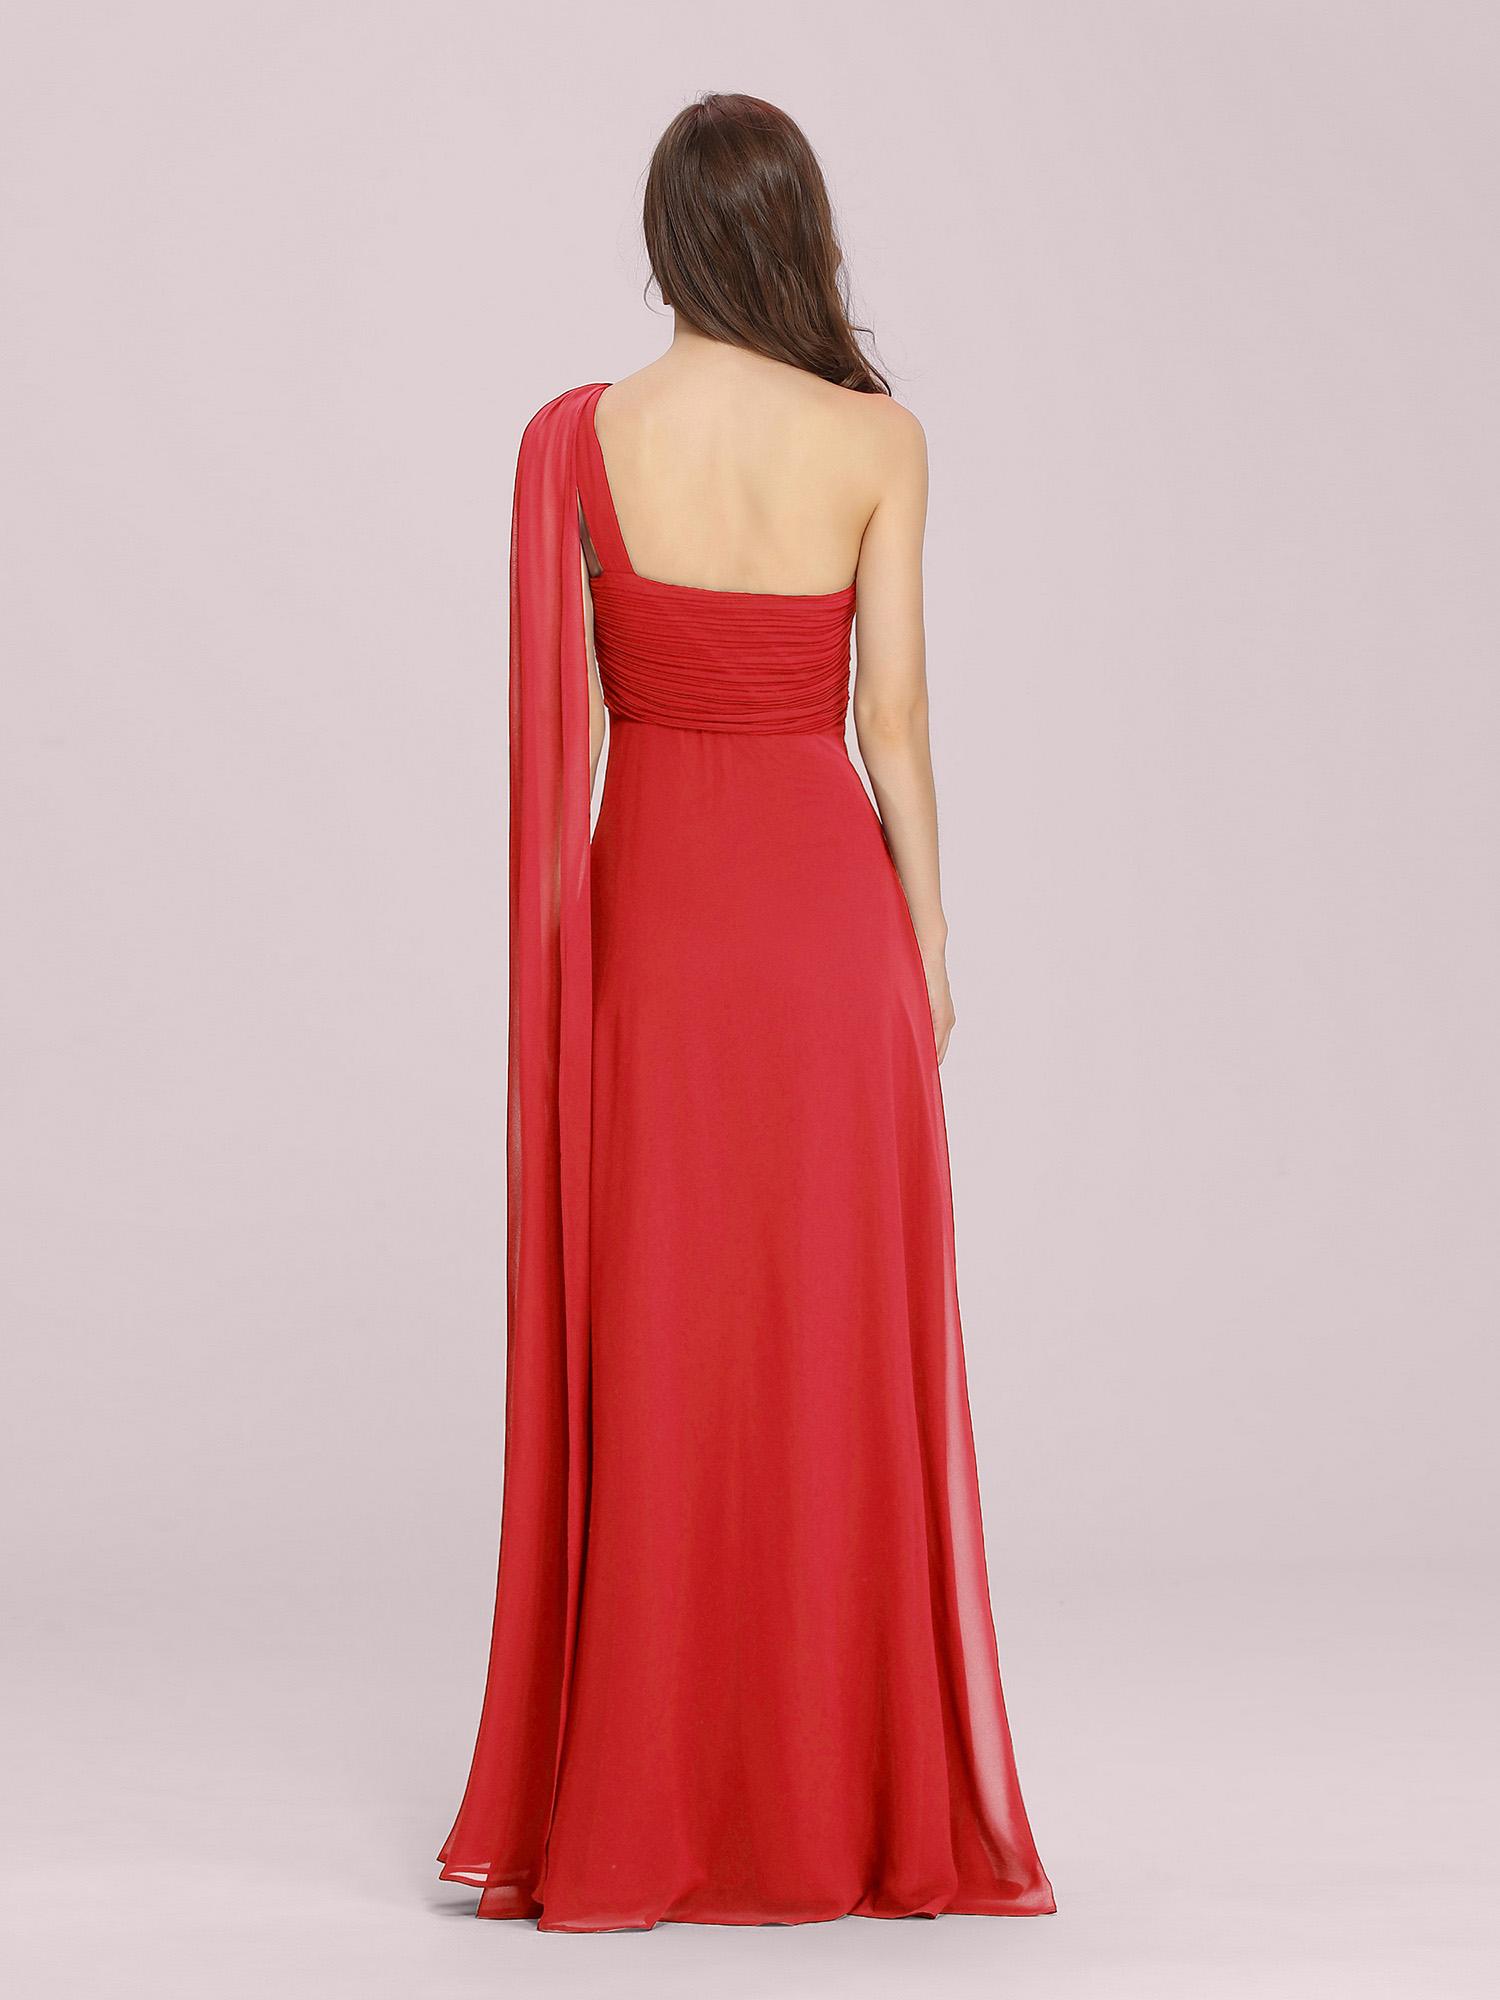 Ever-Pretty-Bridesmaid-Dresses-Chiffon-Ribbon-Long-Formal-Cocktail-Party-Dress thumbnail 29